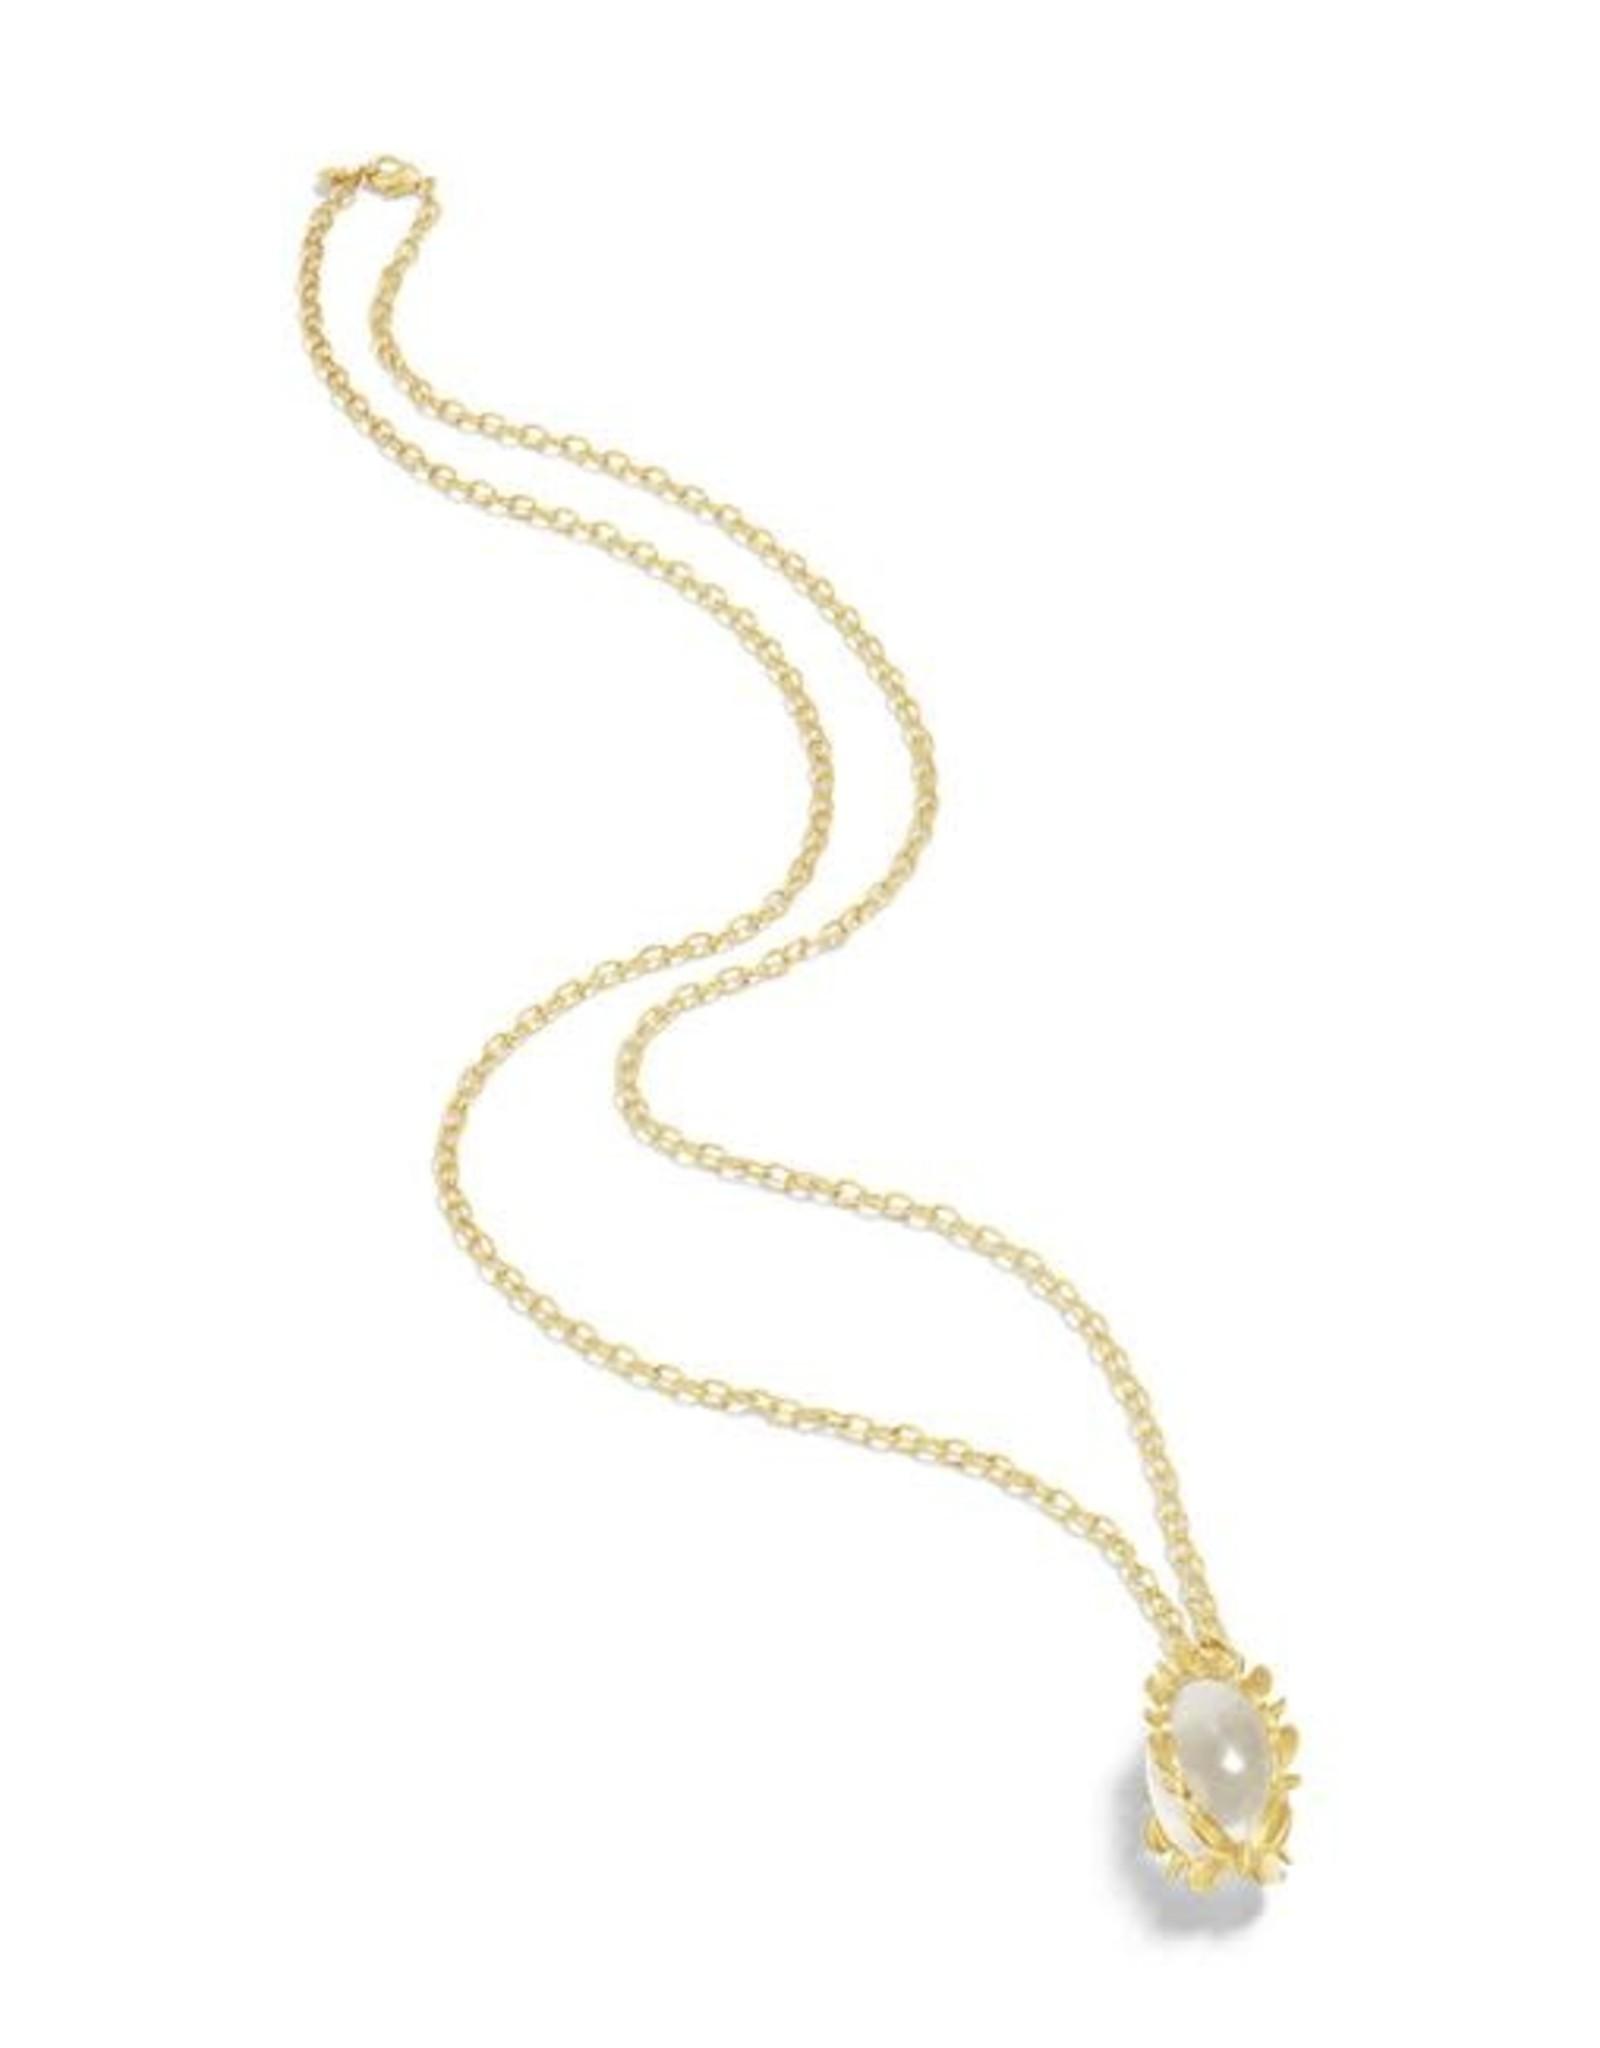 Capucine de Wulf Bliss Pendant Necklace